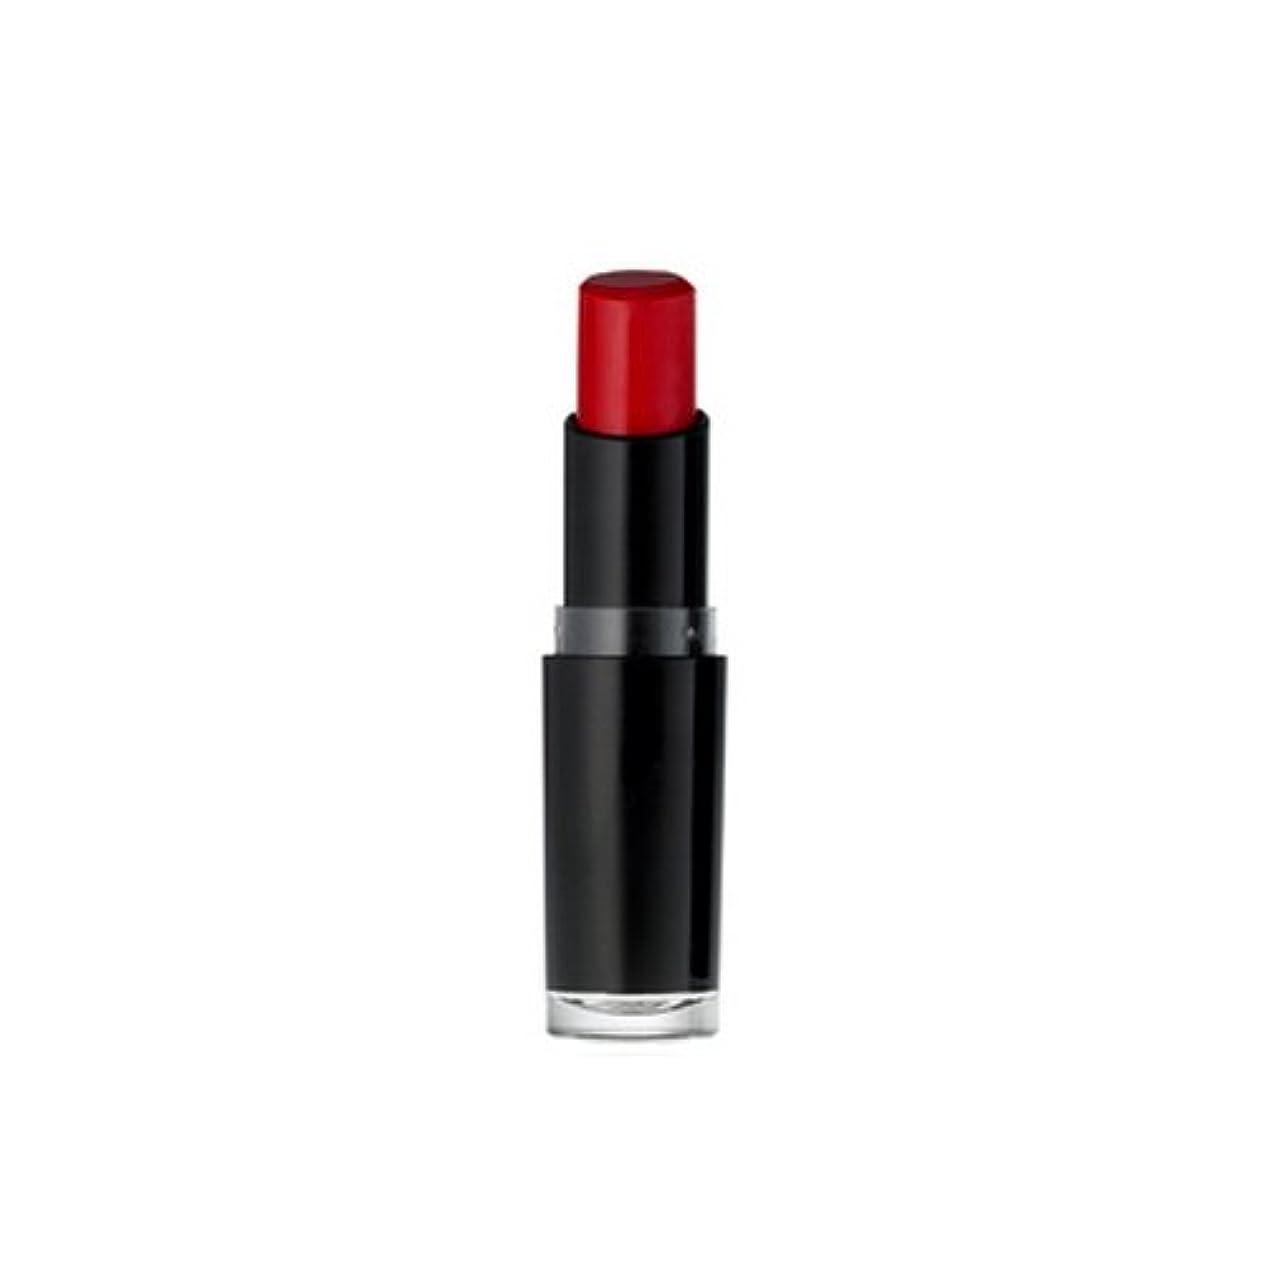 段階物理学者反論(6 Pack) WET N WILD Mega Last Matte Lip Cover - Smokin' Hot Pink (並行輸入品)